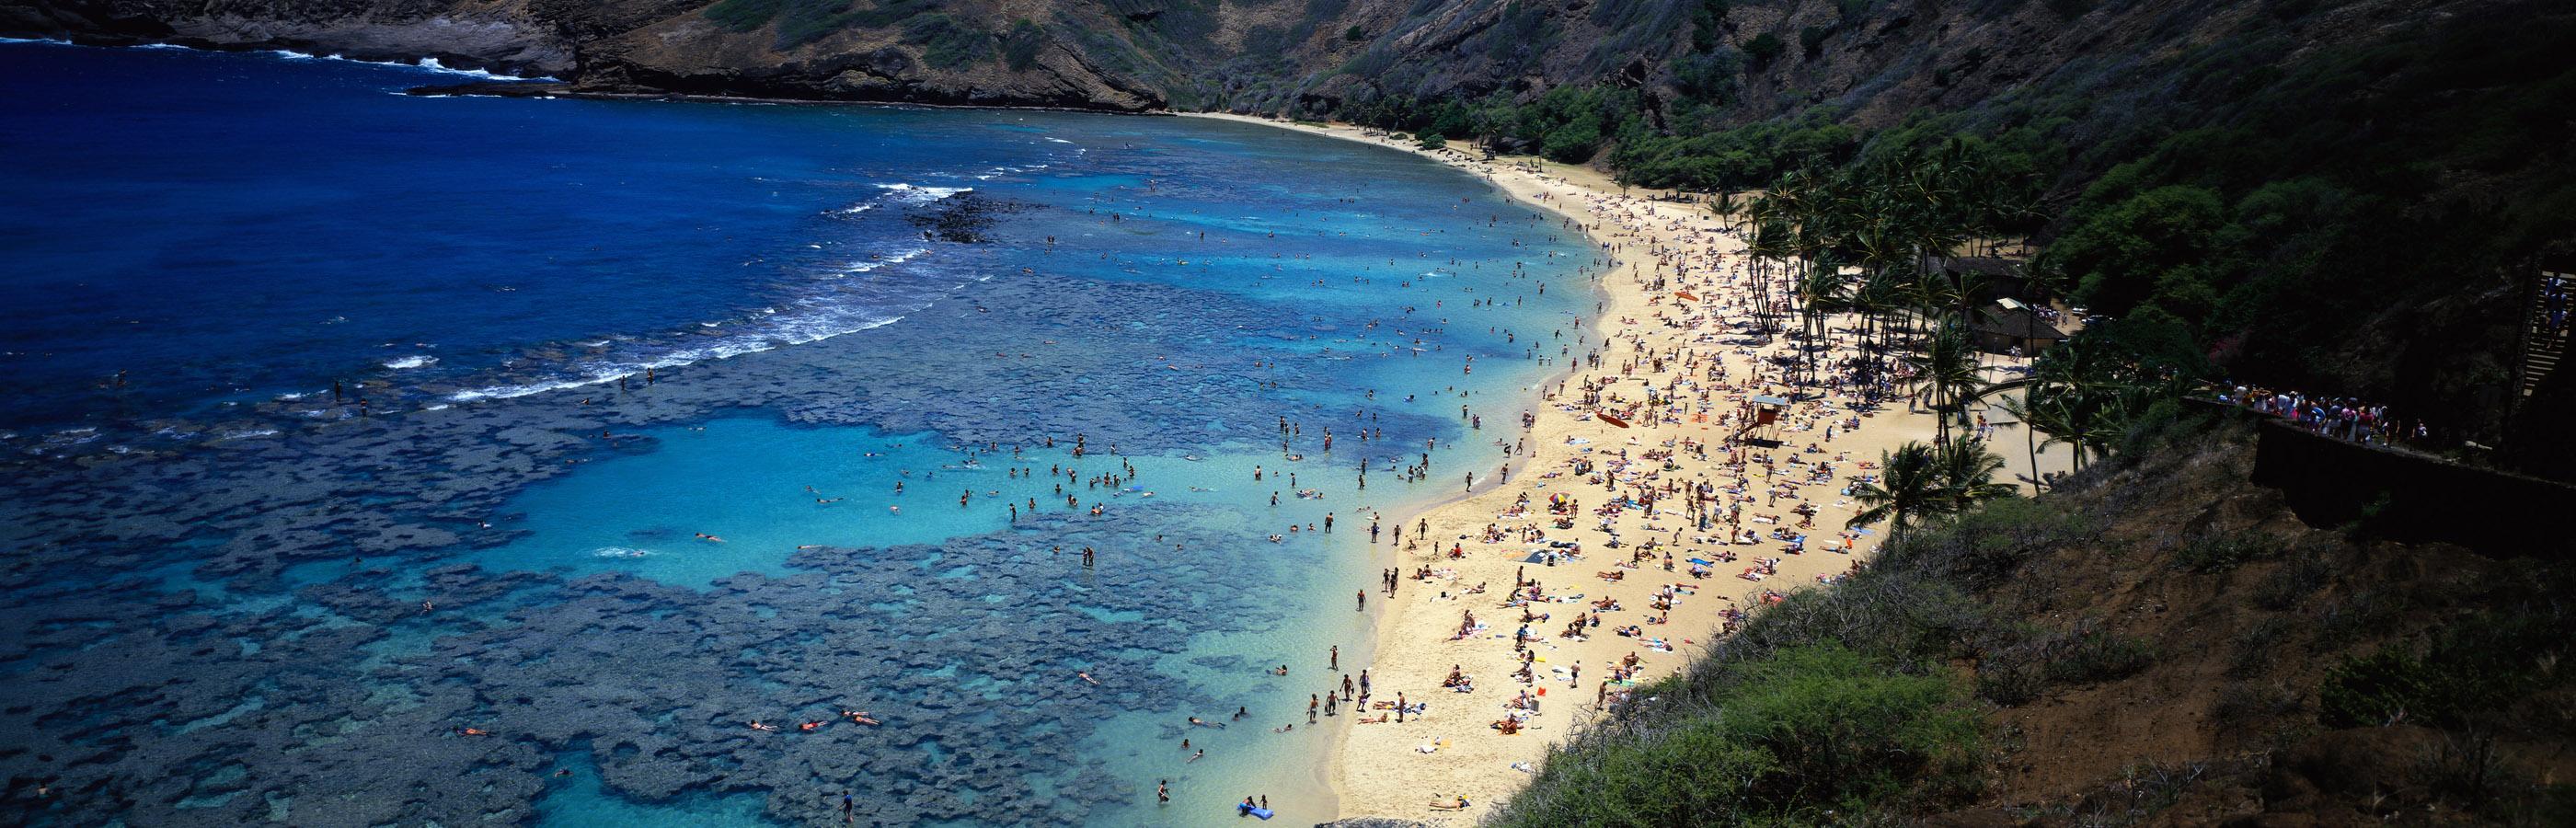 panoramic photos panoramic landscape 2880x900 dualscreenwallpapers 2800x900